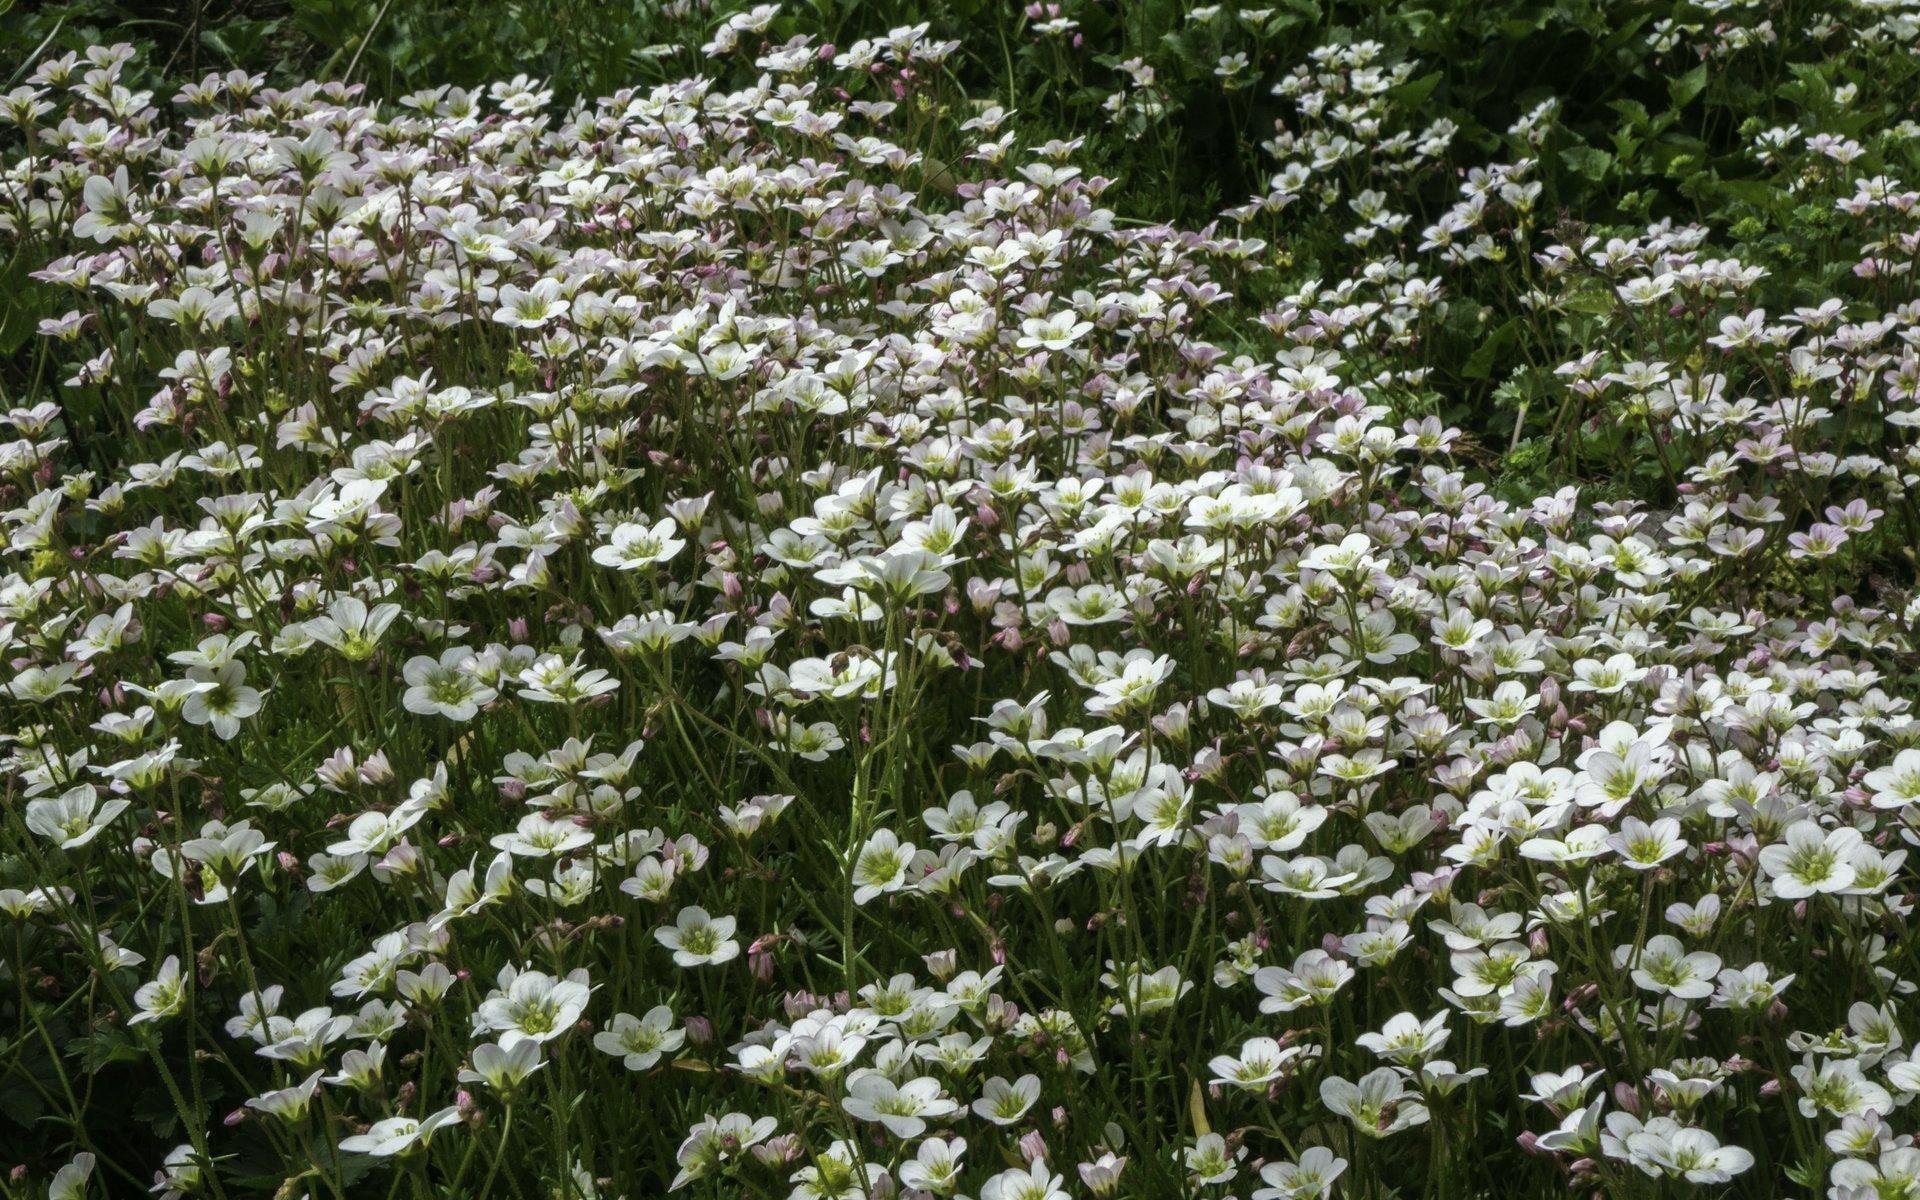 Fetthenne bei den Sommerblumen im Stadtpark